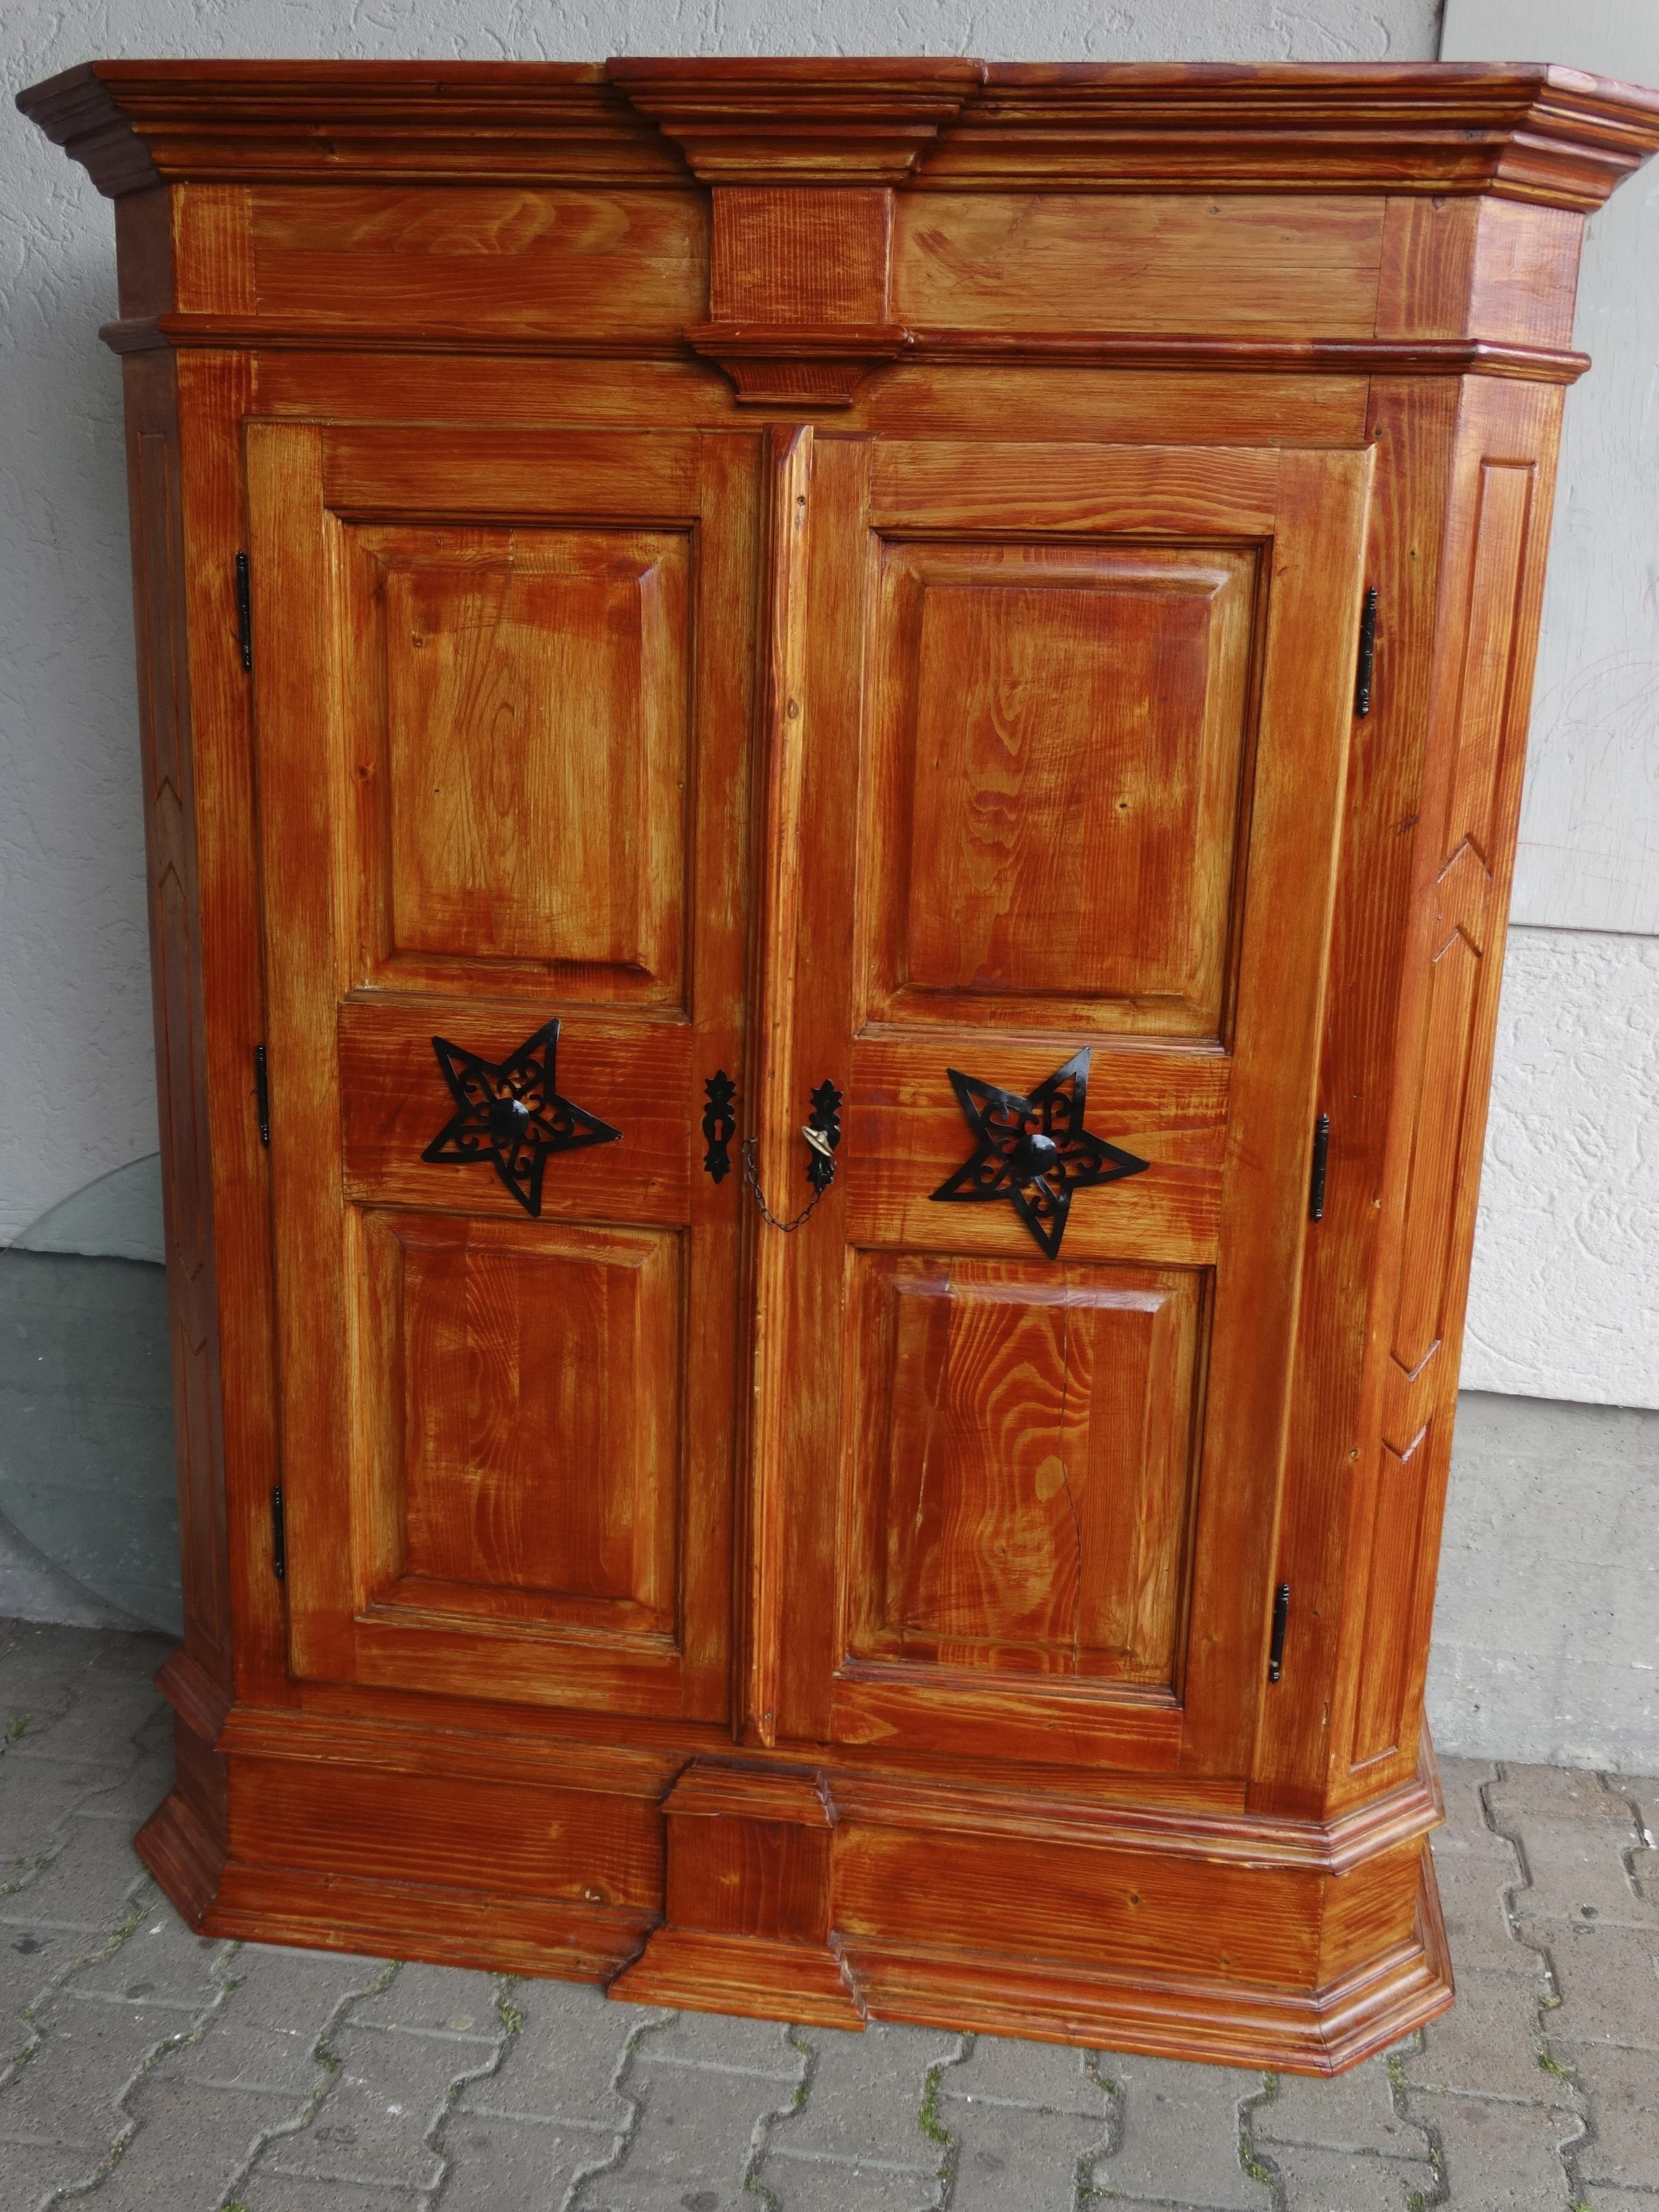 Wood antique live red brown craft black furniture chest hardwood decorative wardrobe restored cupboard sideboard setup